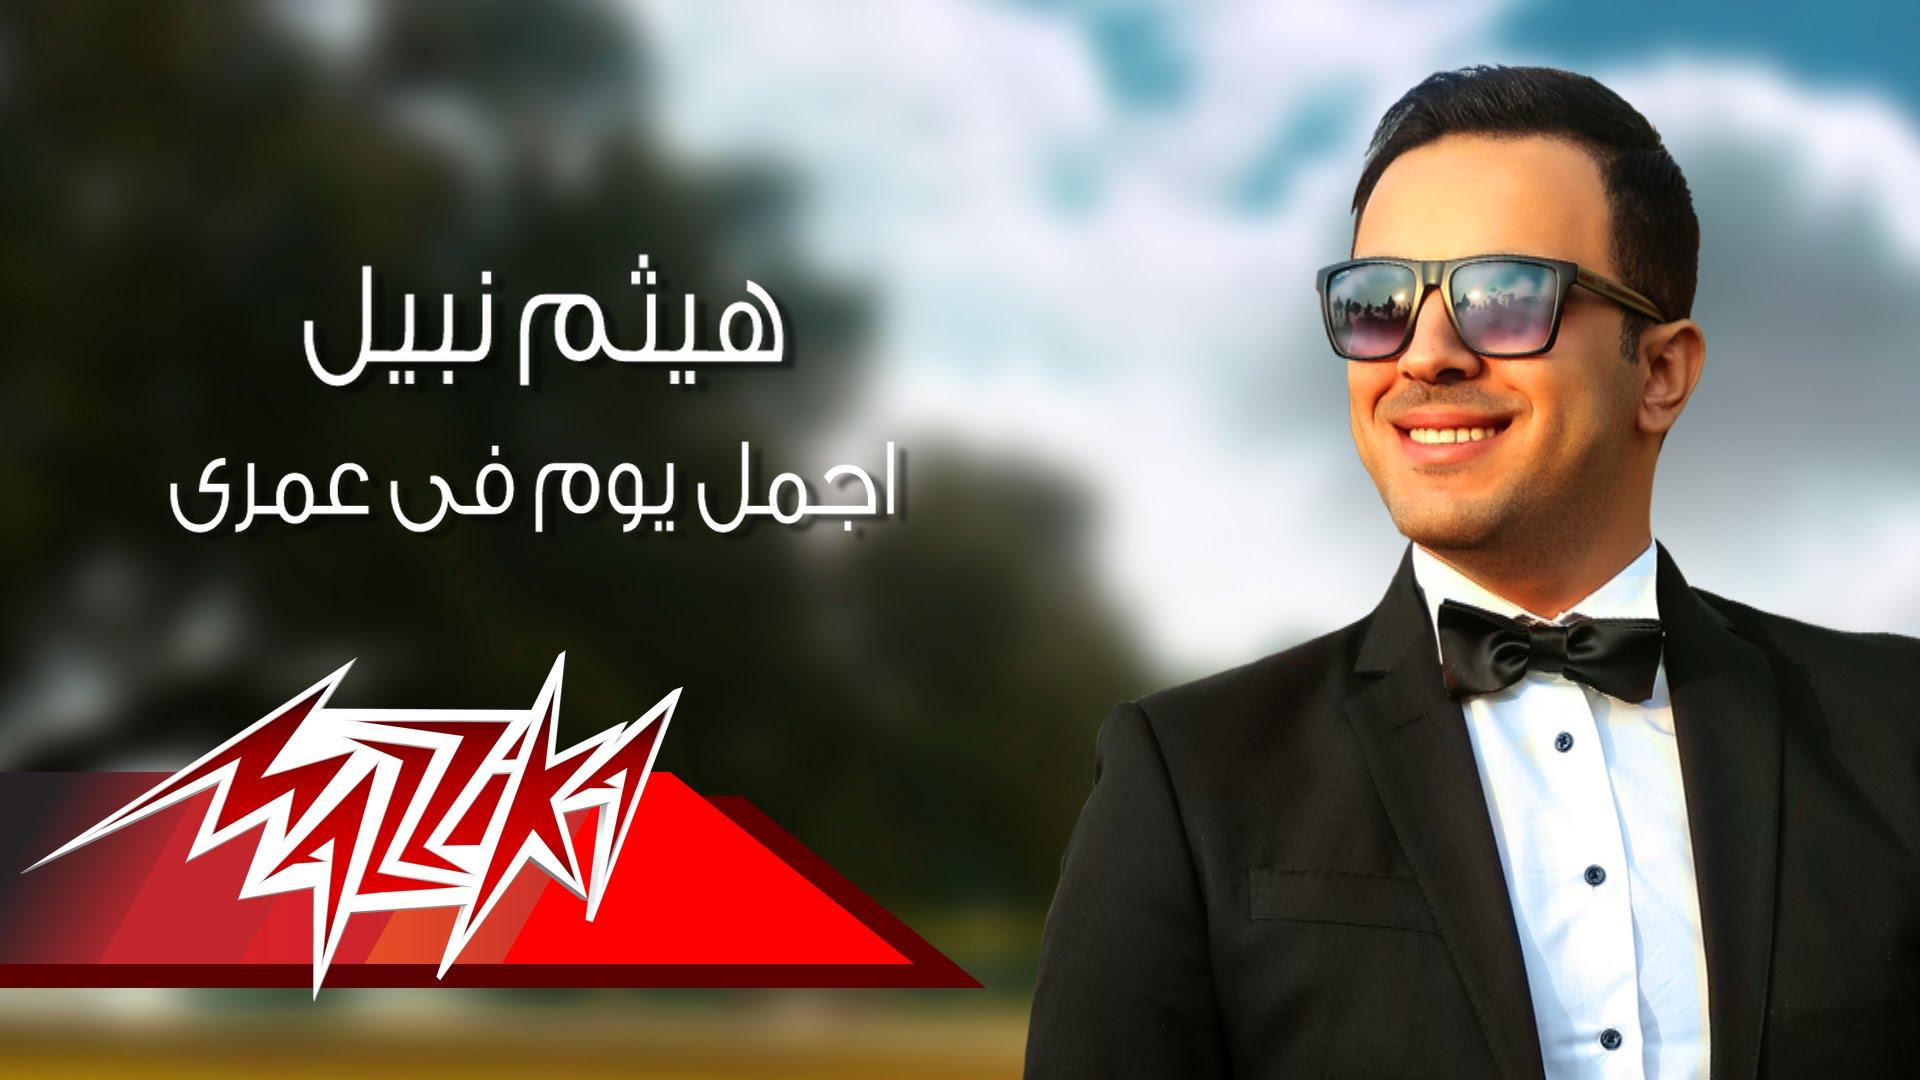 Agmal Youm Fi Omry - Haitham Nabil اجمل يوم فى عمرى - هيثم نبيل